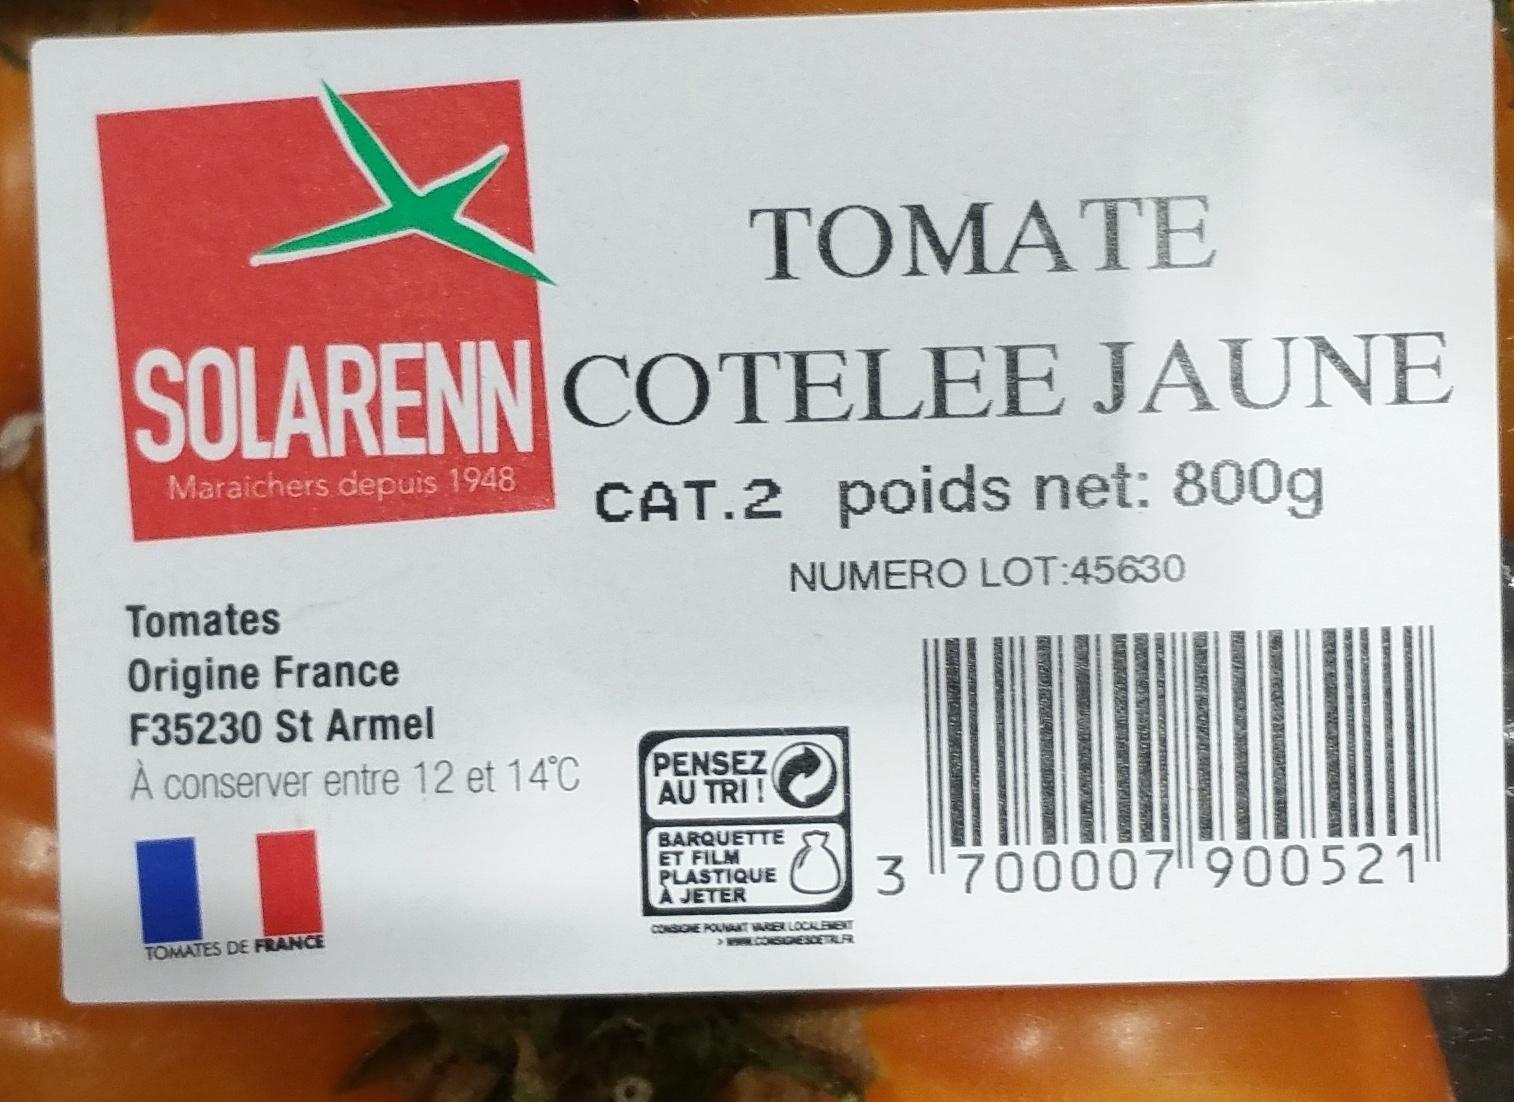 Tomate côtelée Jaune - Ingrédients - fr